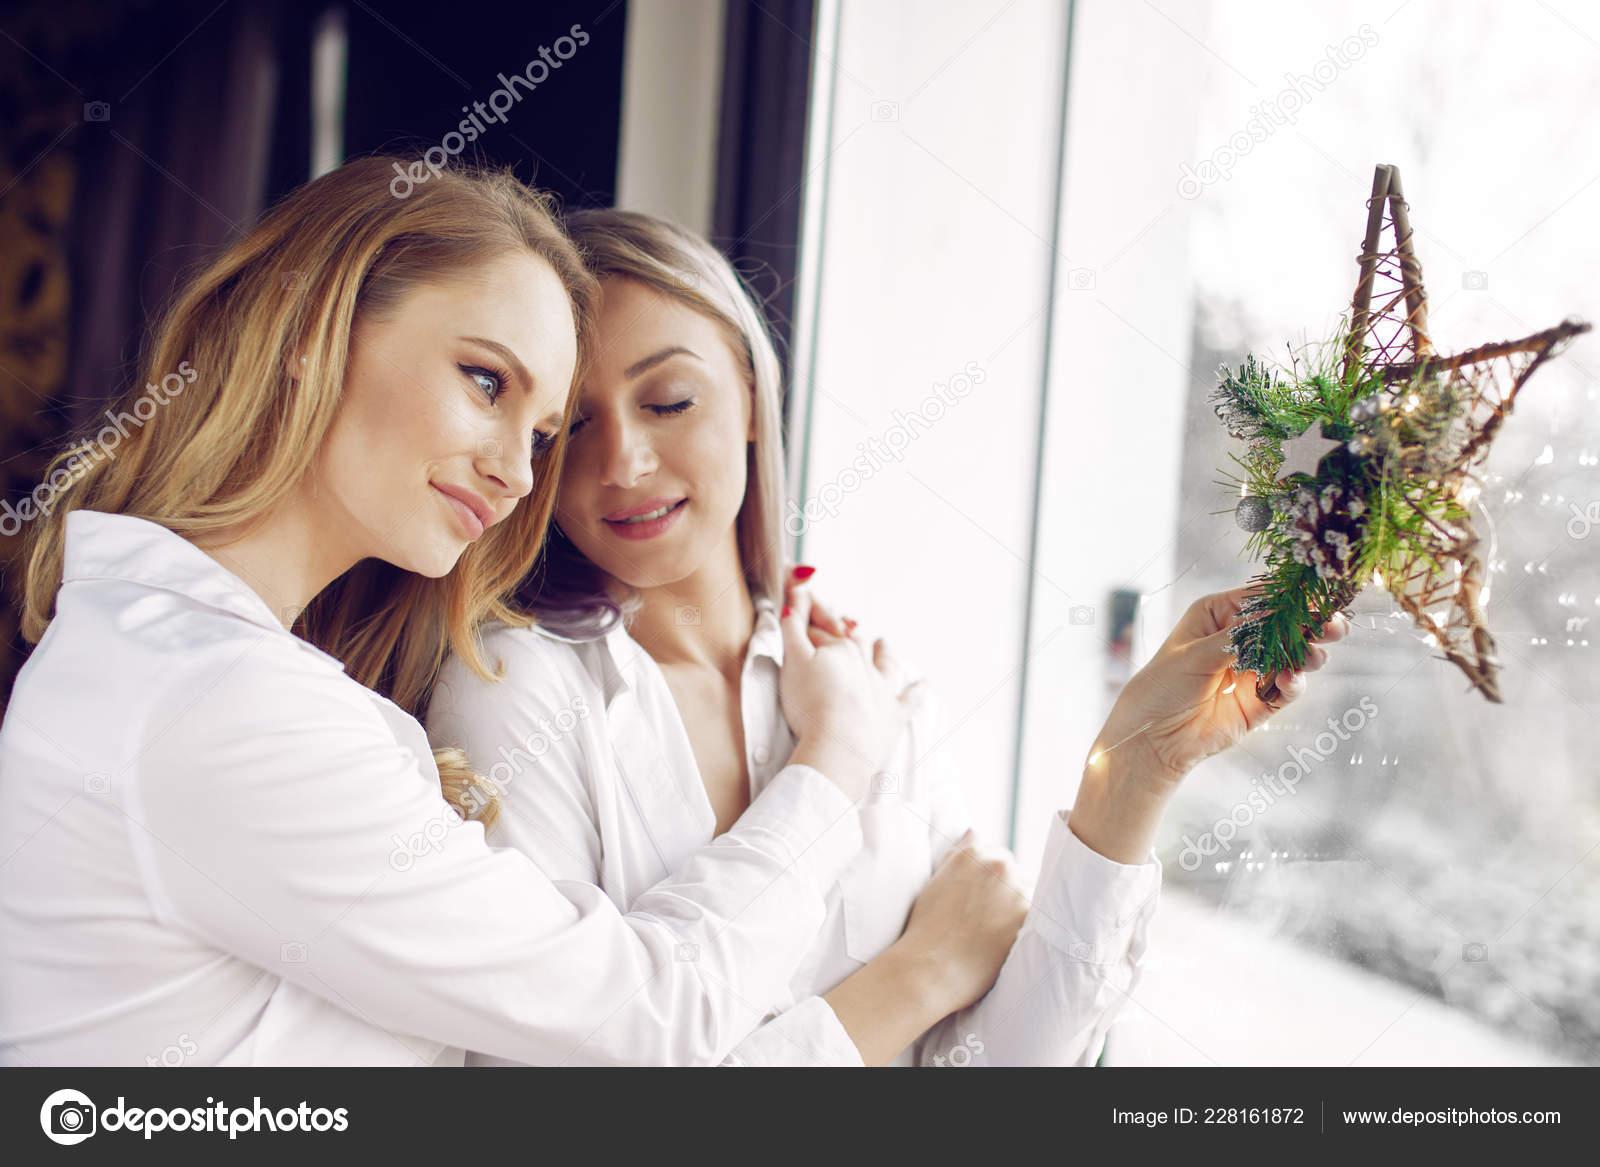 Piss lesbi close fuckd